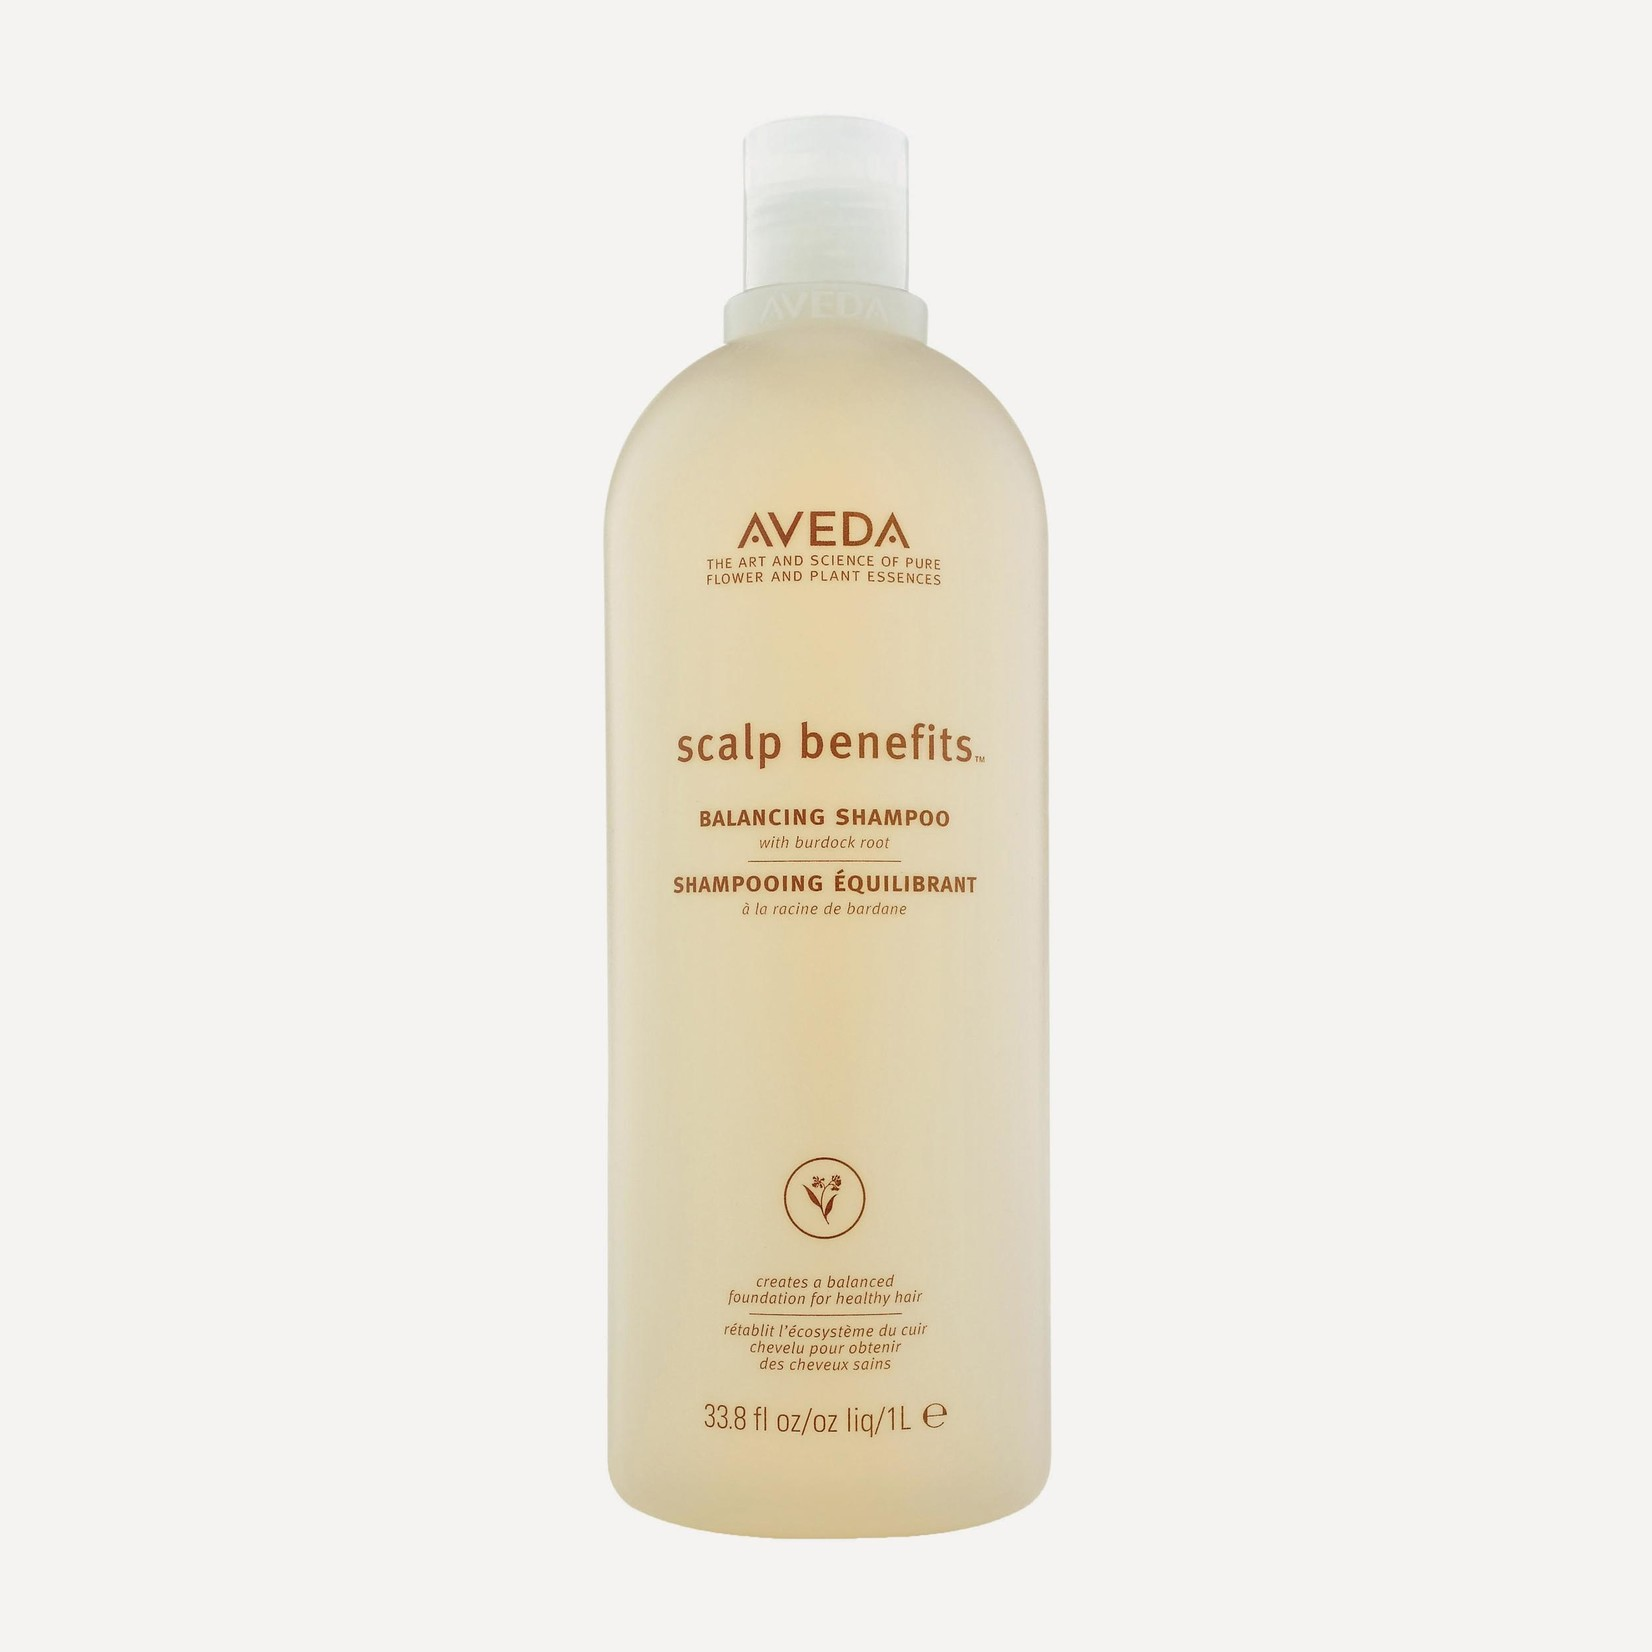 AVEDA Scalp Benefits™ Balancing Shampoo